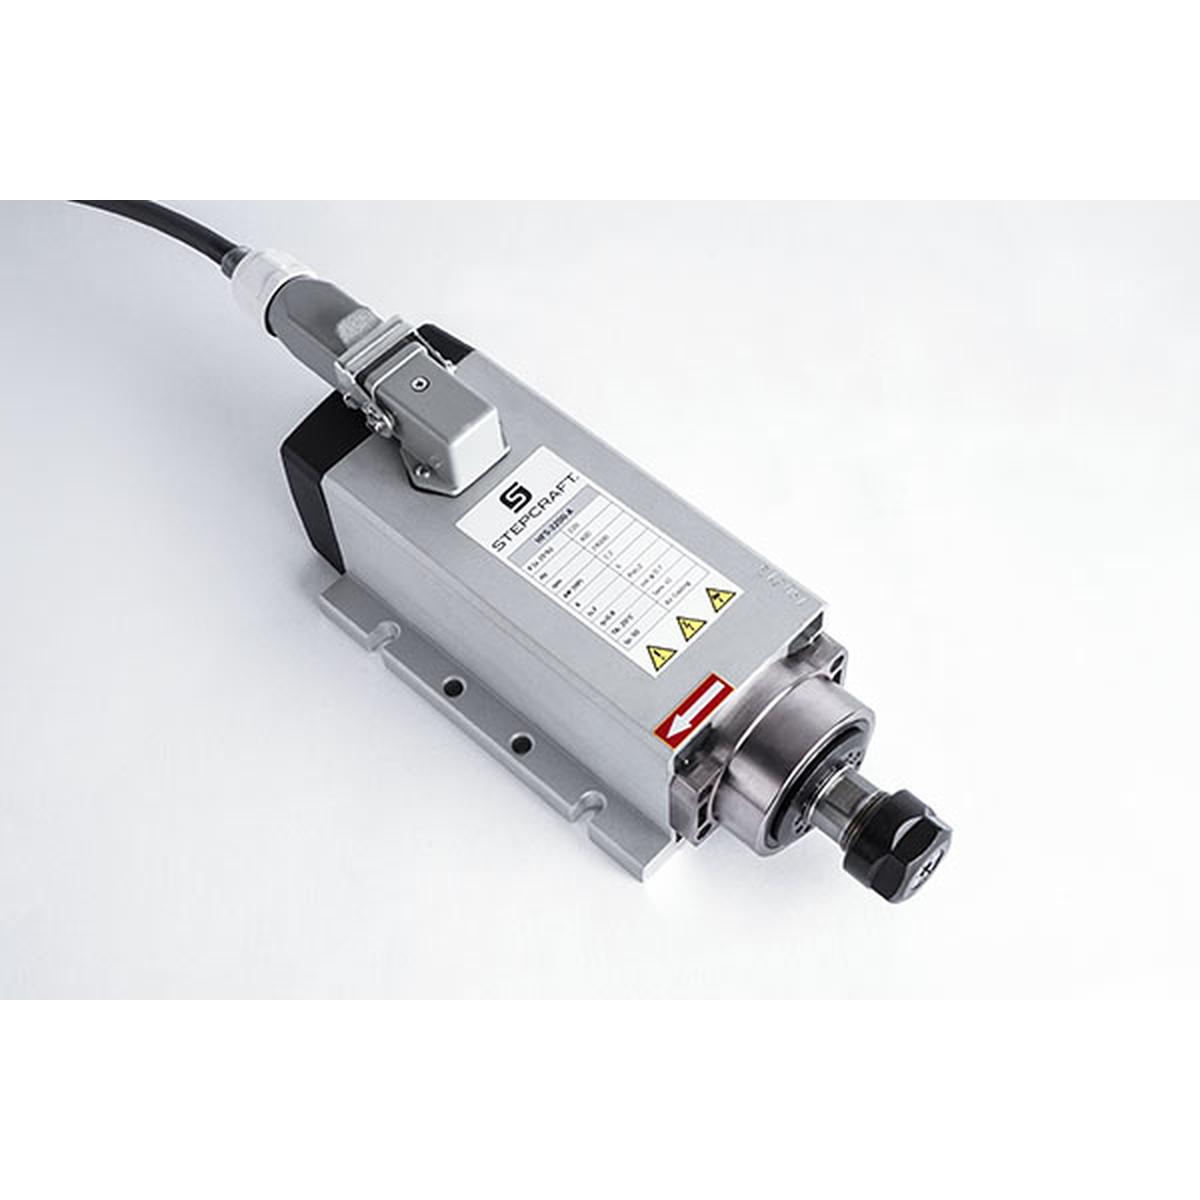 hfs-2200-a-milling-motor-eu-230-v